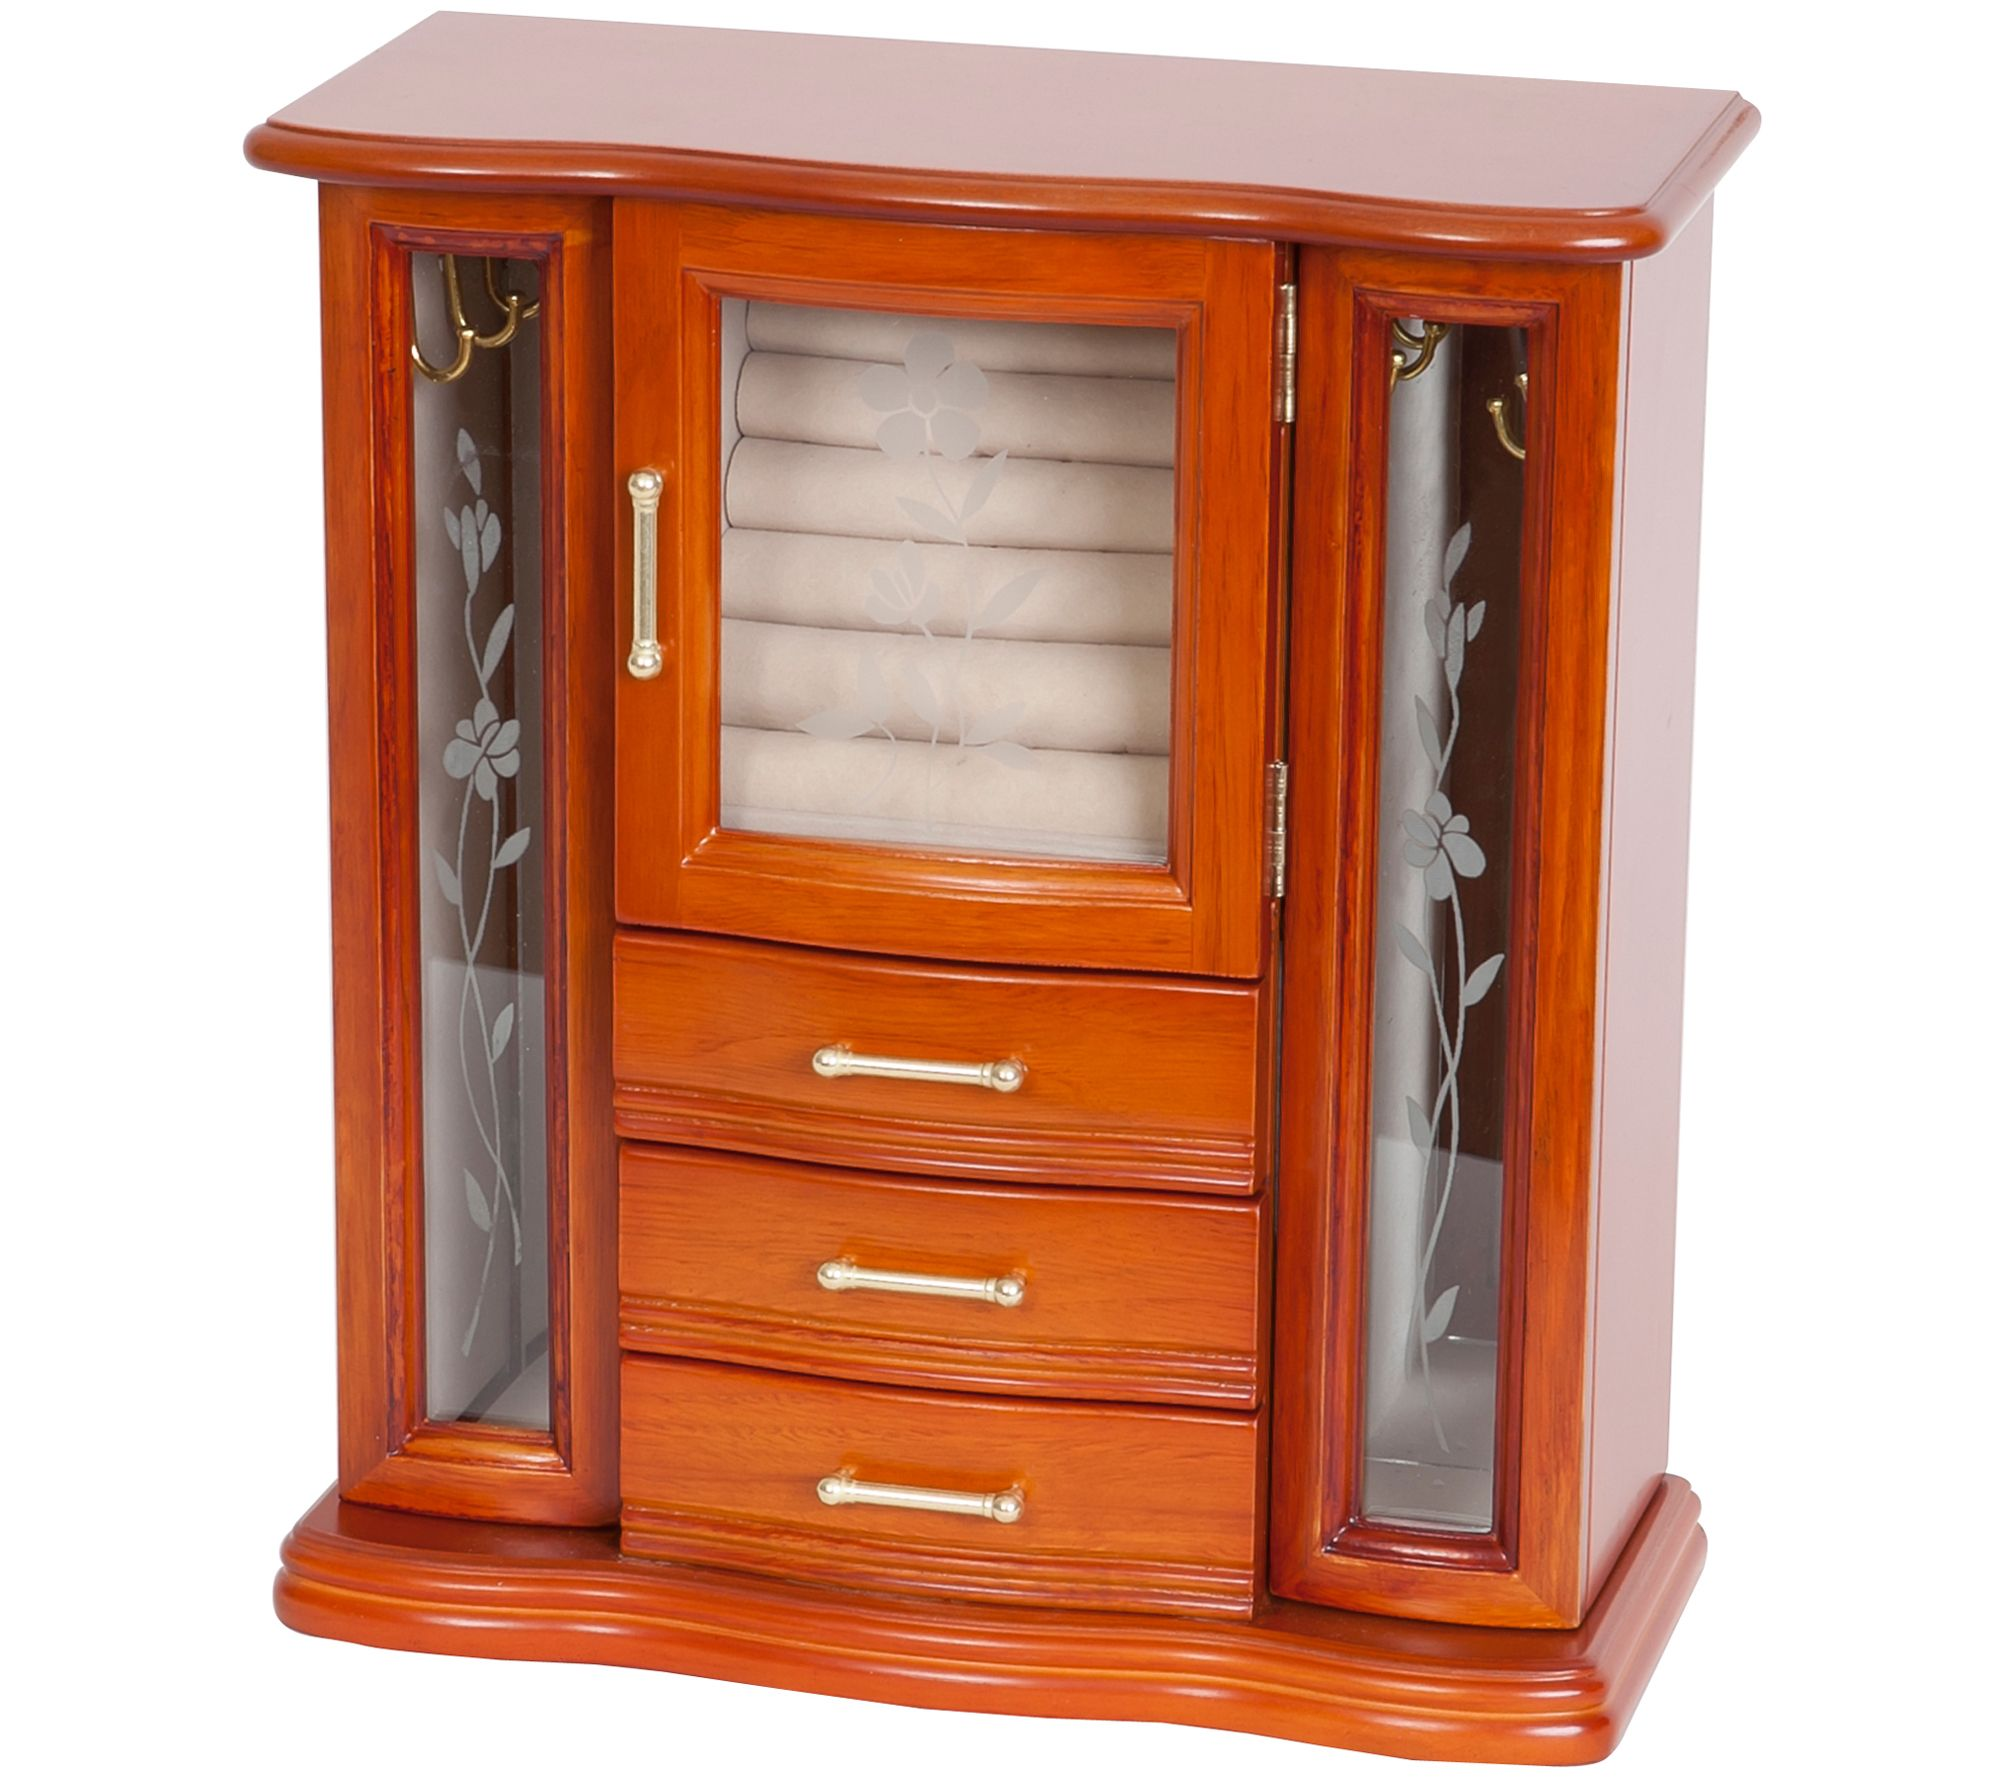 Mele Amp Co Richmond Wooden Jewelry Box Page 1 Qvc Com